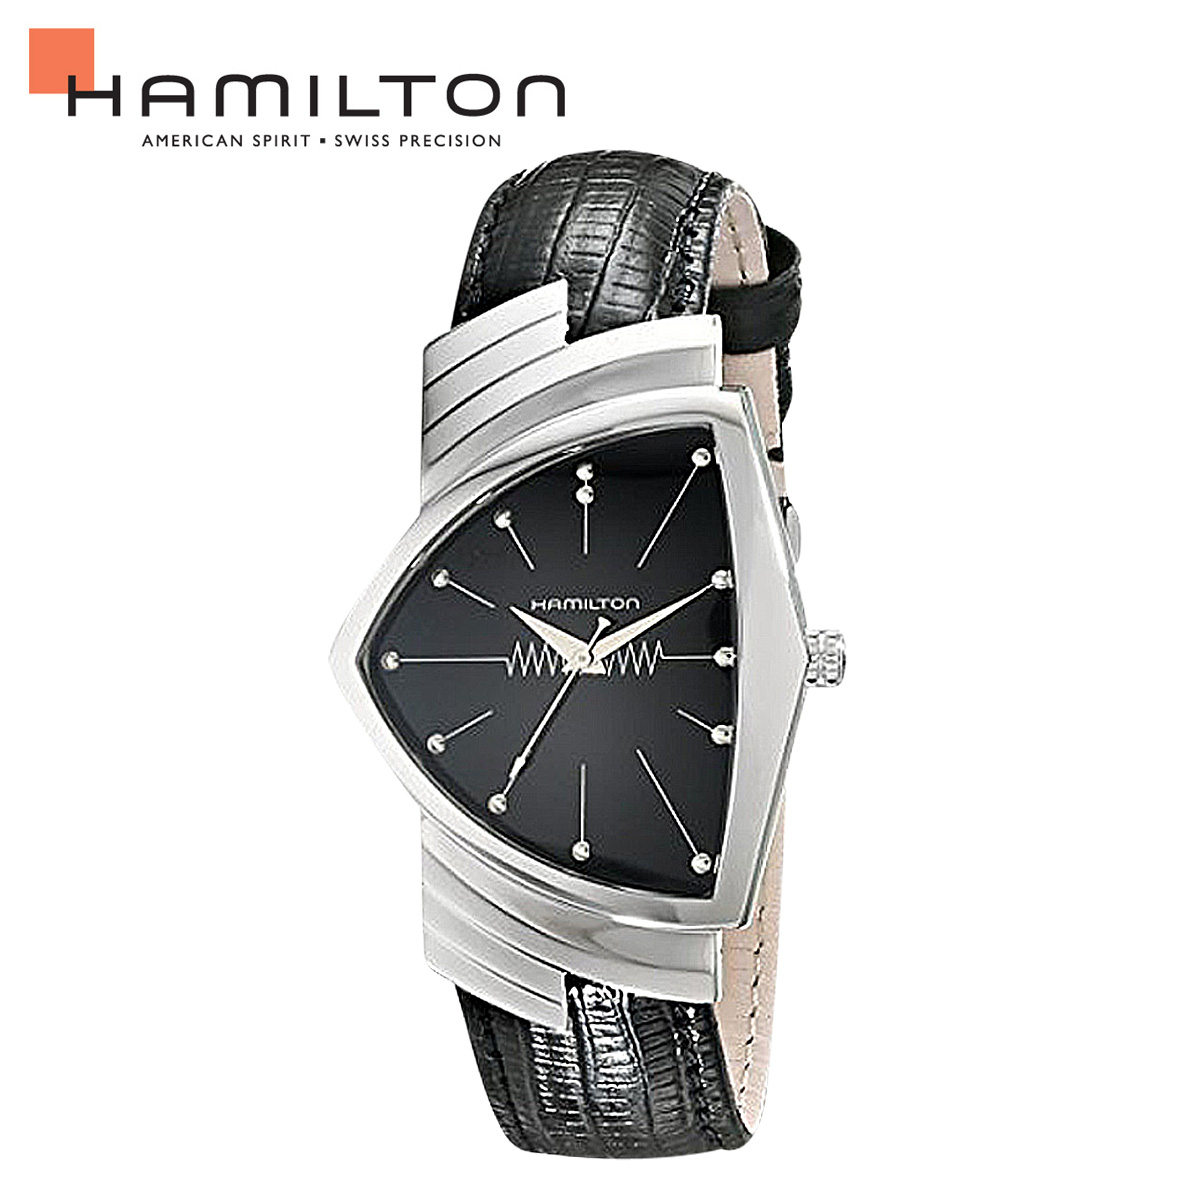 HAMILTON ハミルトン 腕時計 ベンチュラ メンズ 時計 36mm レザー VENTURA QUARTZ H24411732 ブラック 防水 【あす楽対象外】【返品不可】